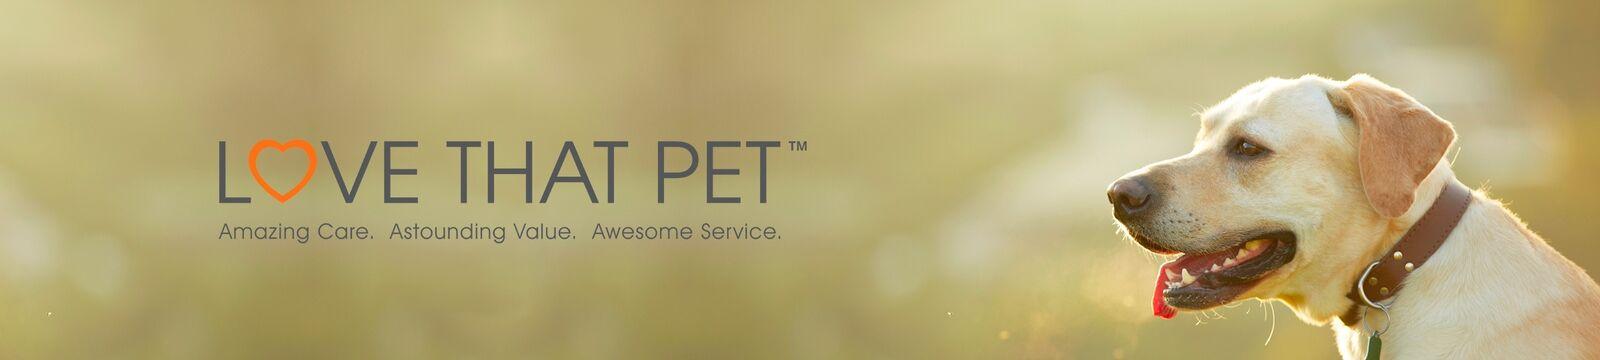 Love That Pet